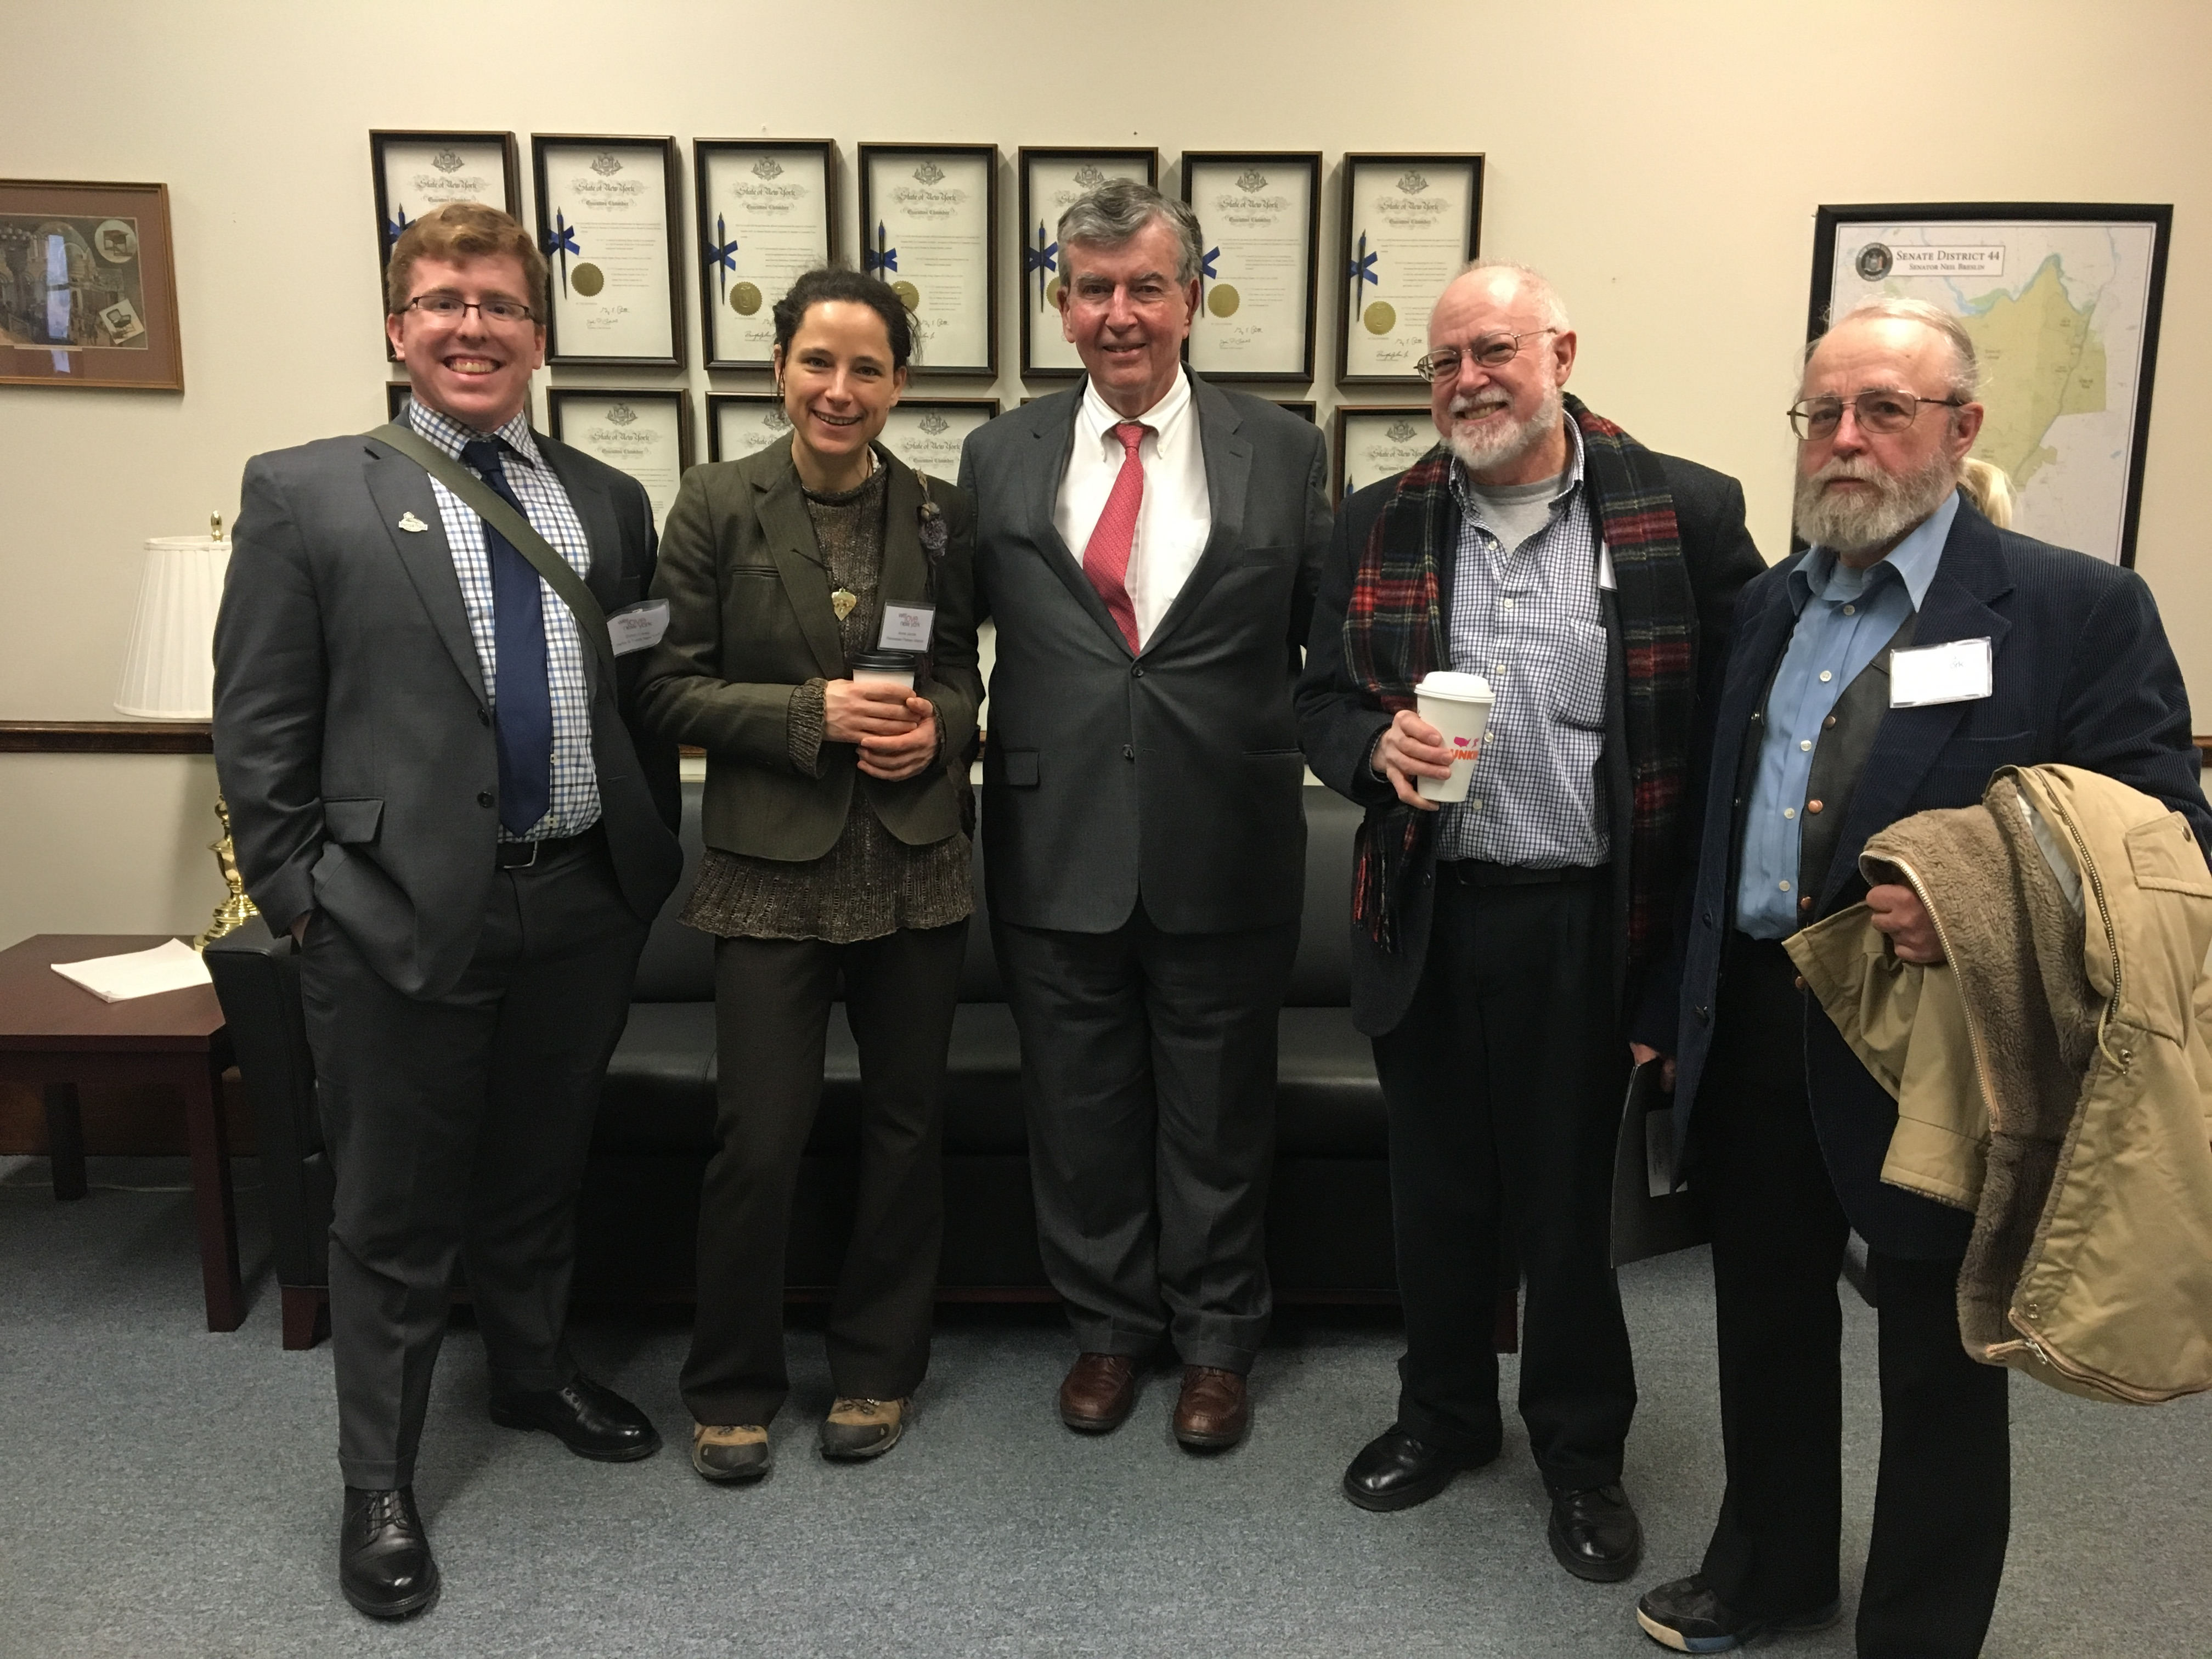 Albany group February 2019